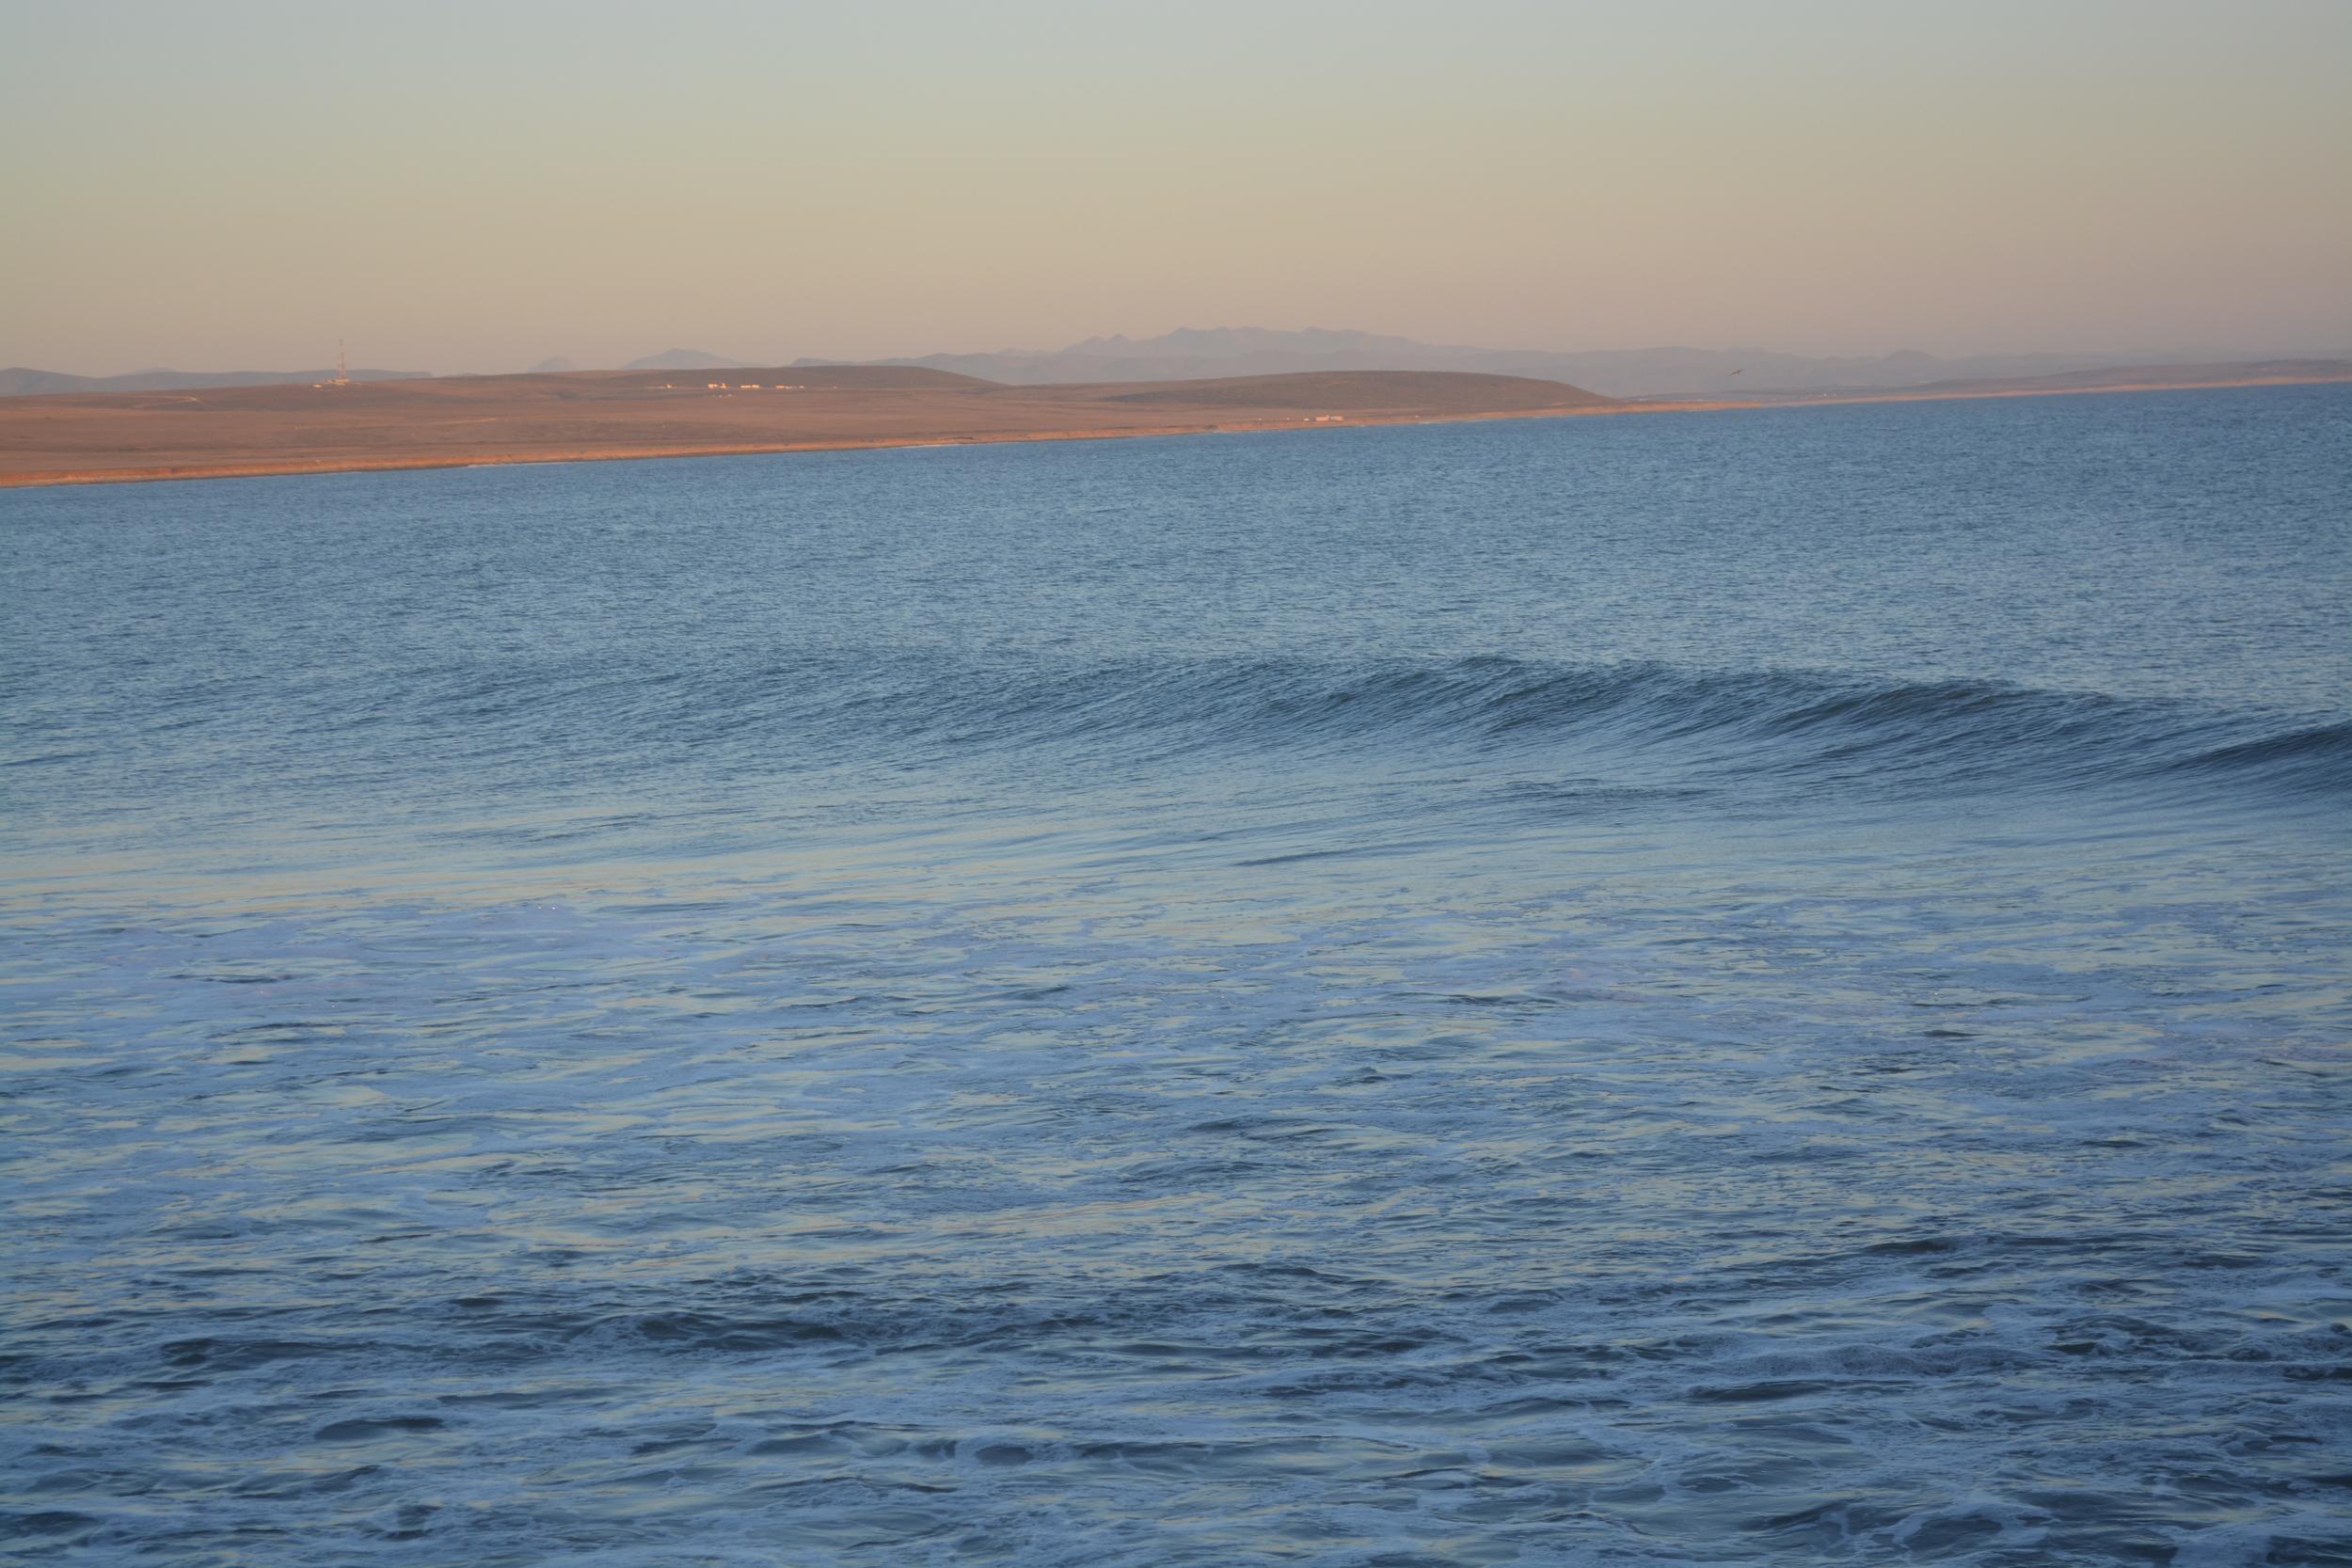 Baja California 10-5-13 Shipwrecks Surfing Adventure Ocean Experience Surf School San Diego (24).JPG